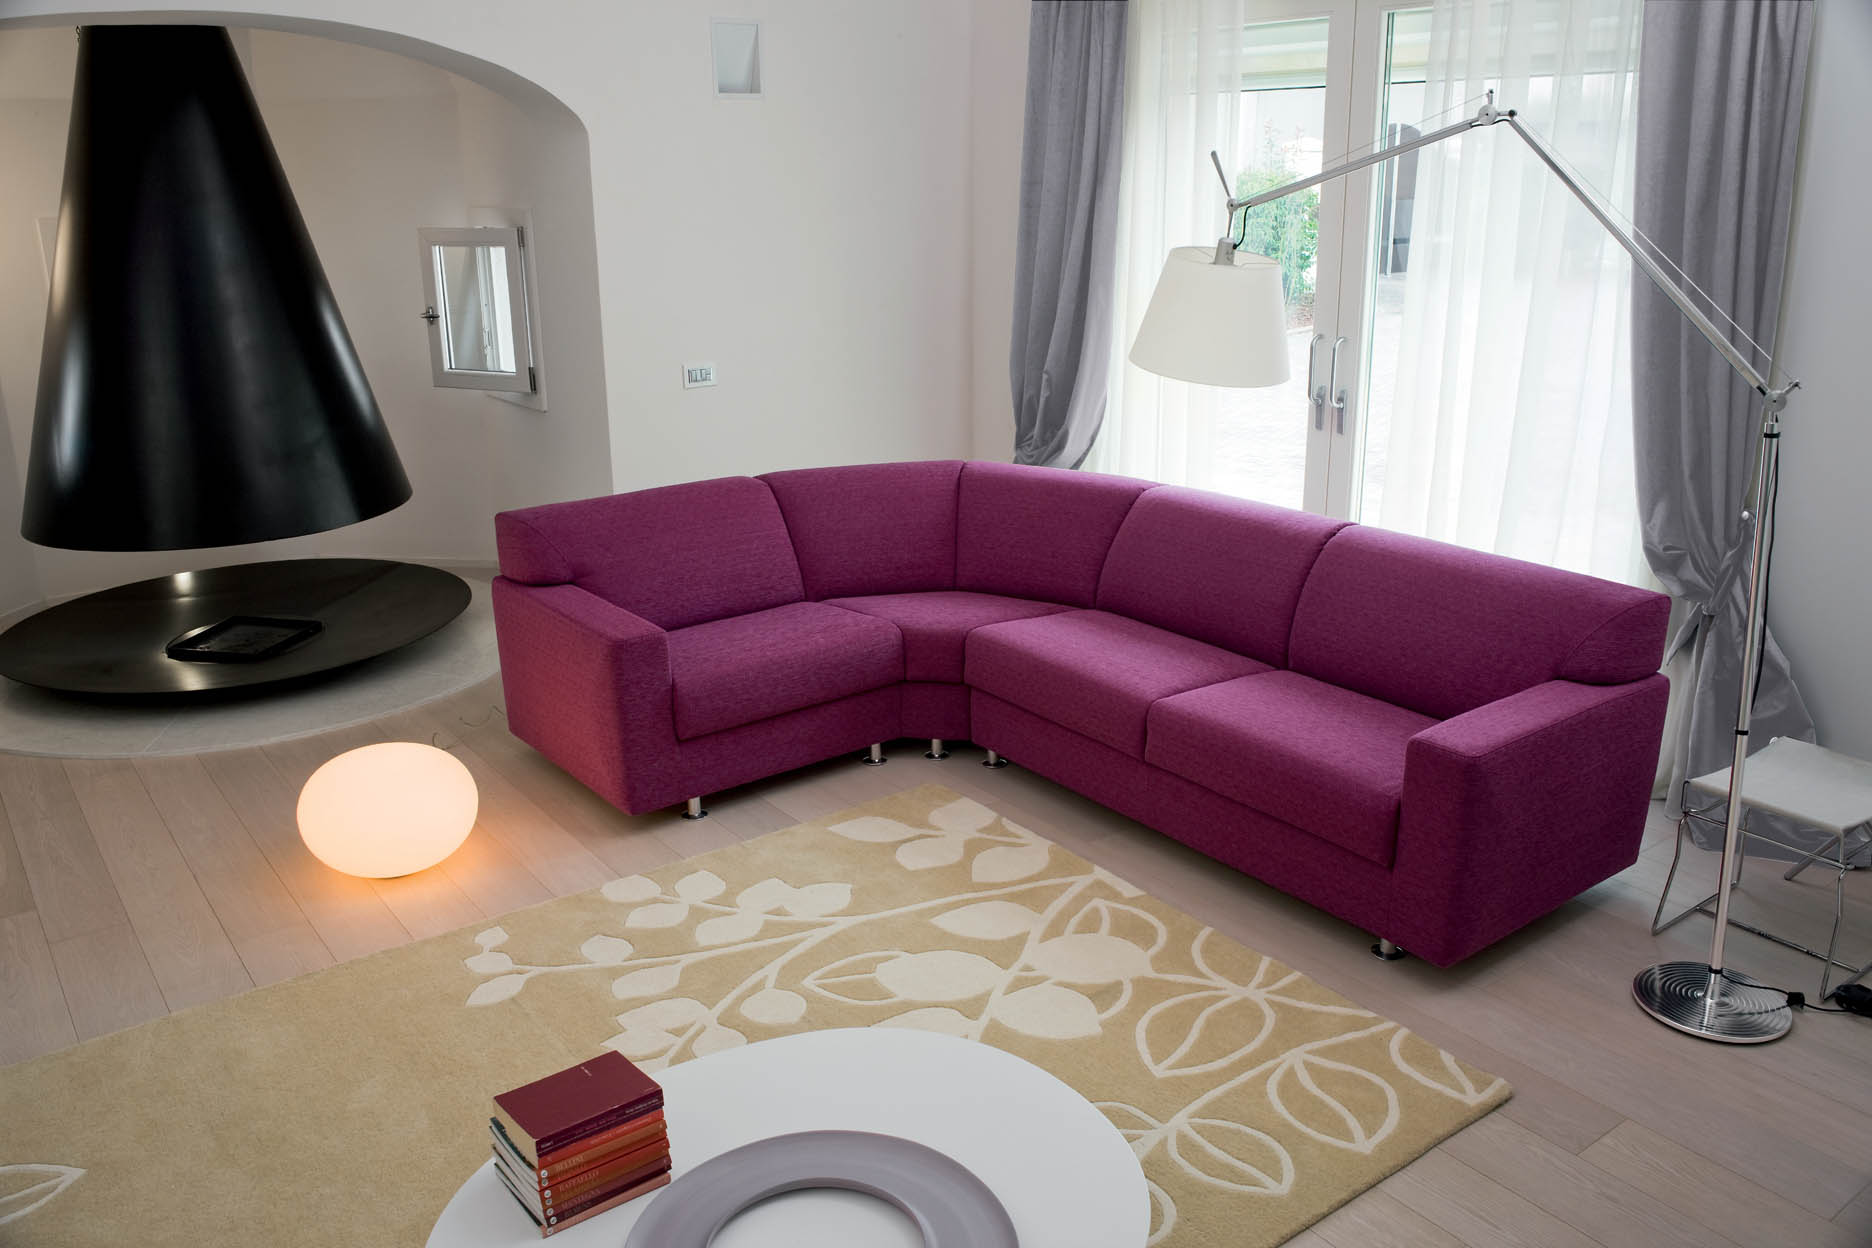 Divano Ad Angolo Ikea. Stunning Piacevole Catalogo Ikea Divani Letto ...